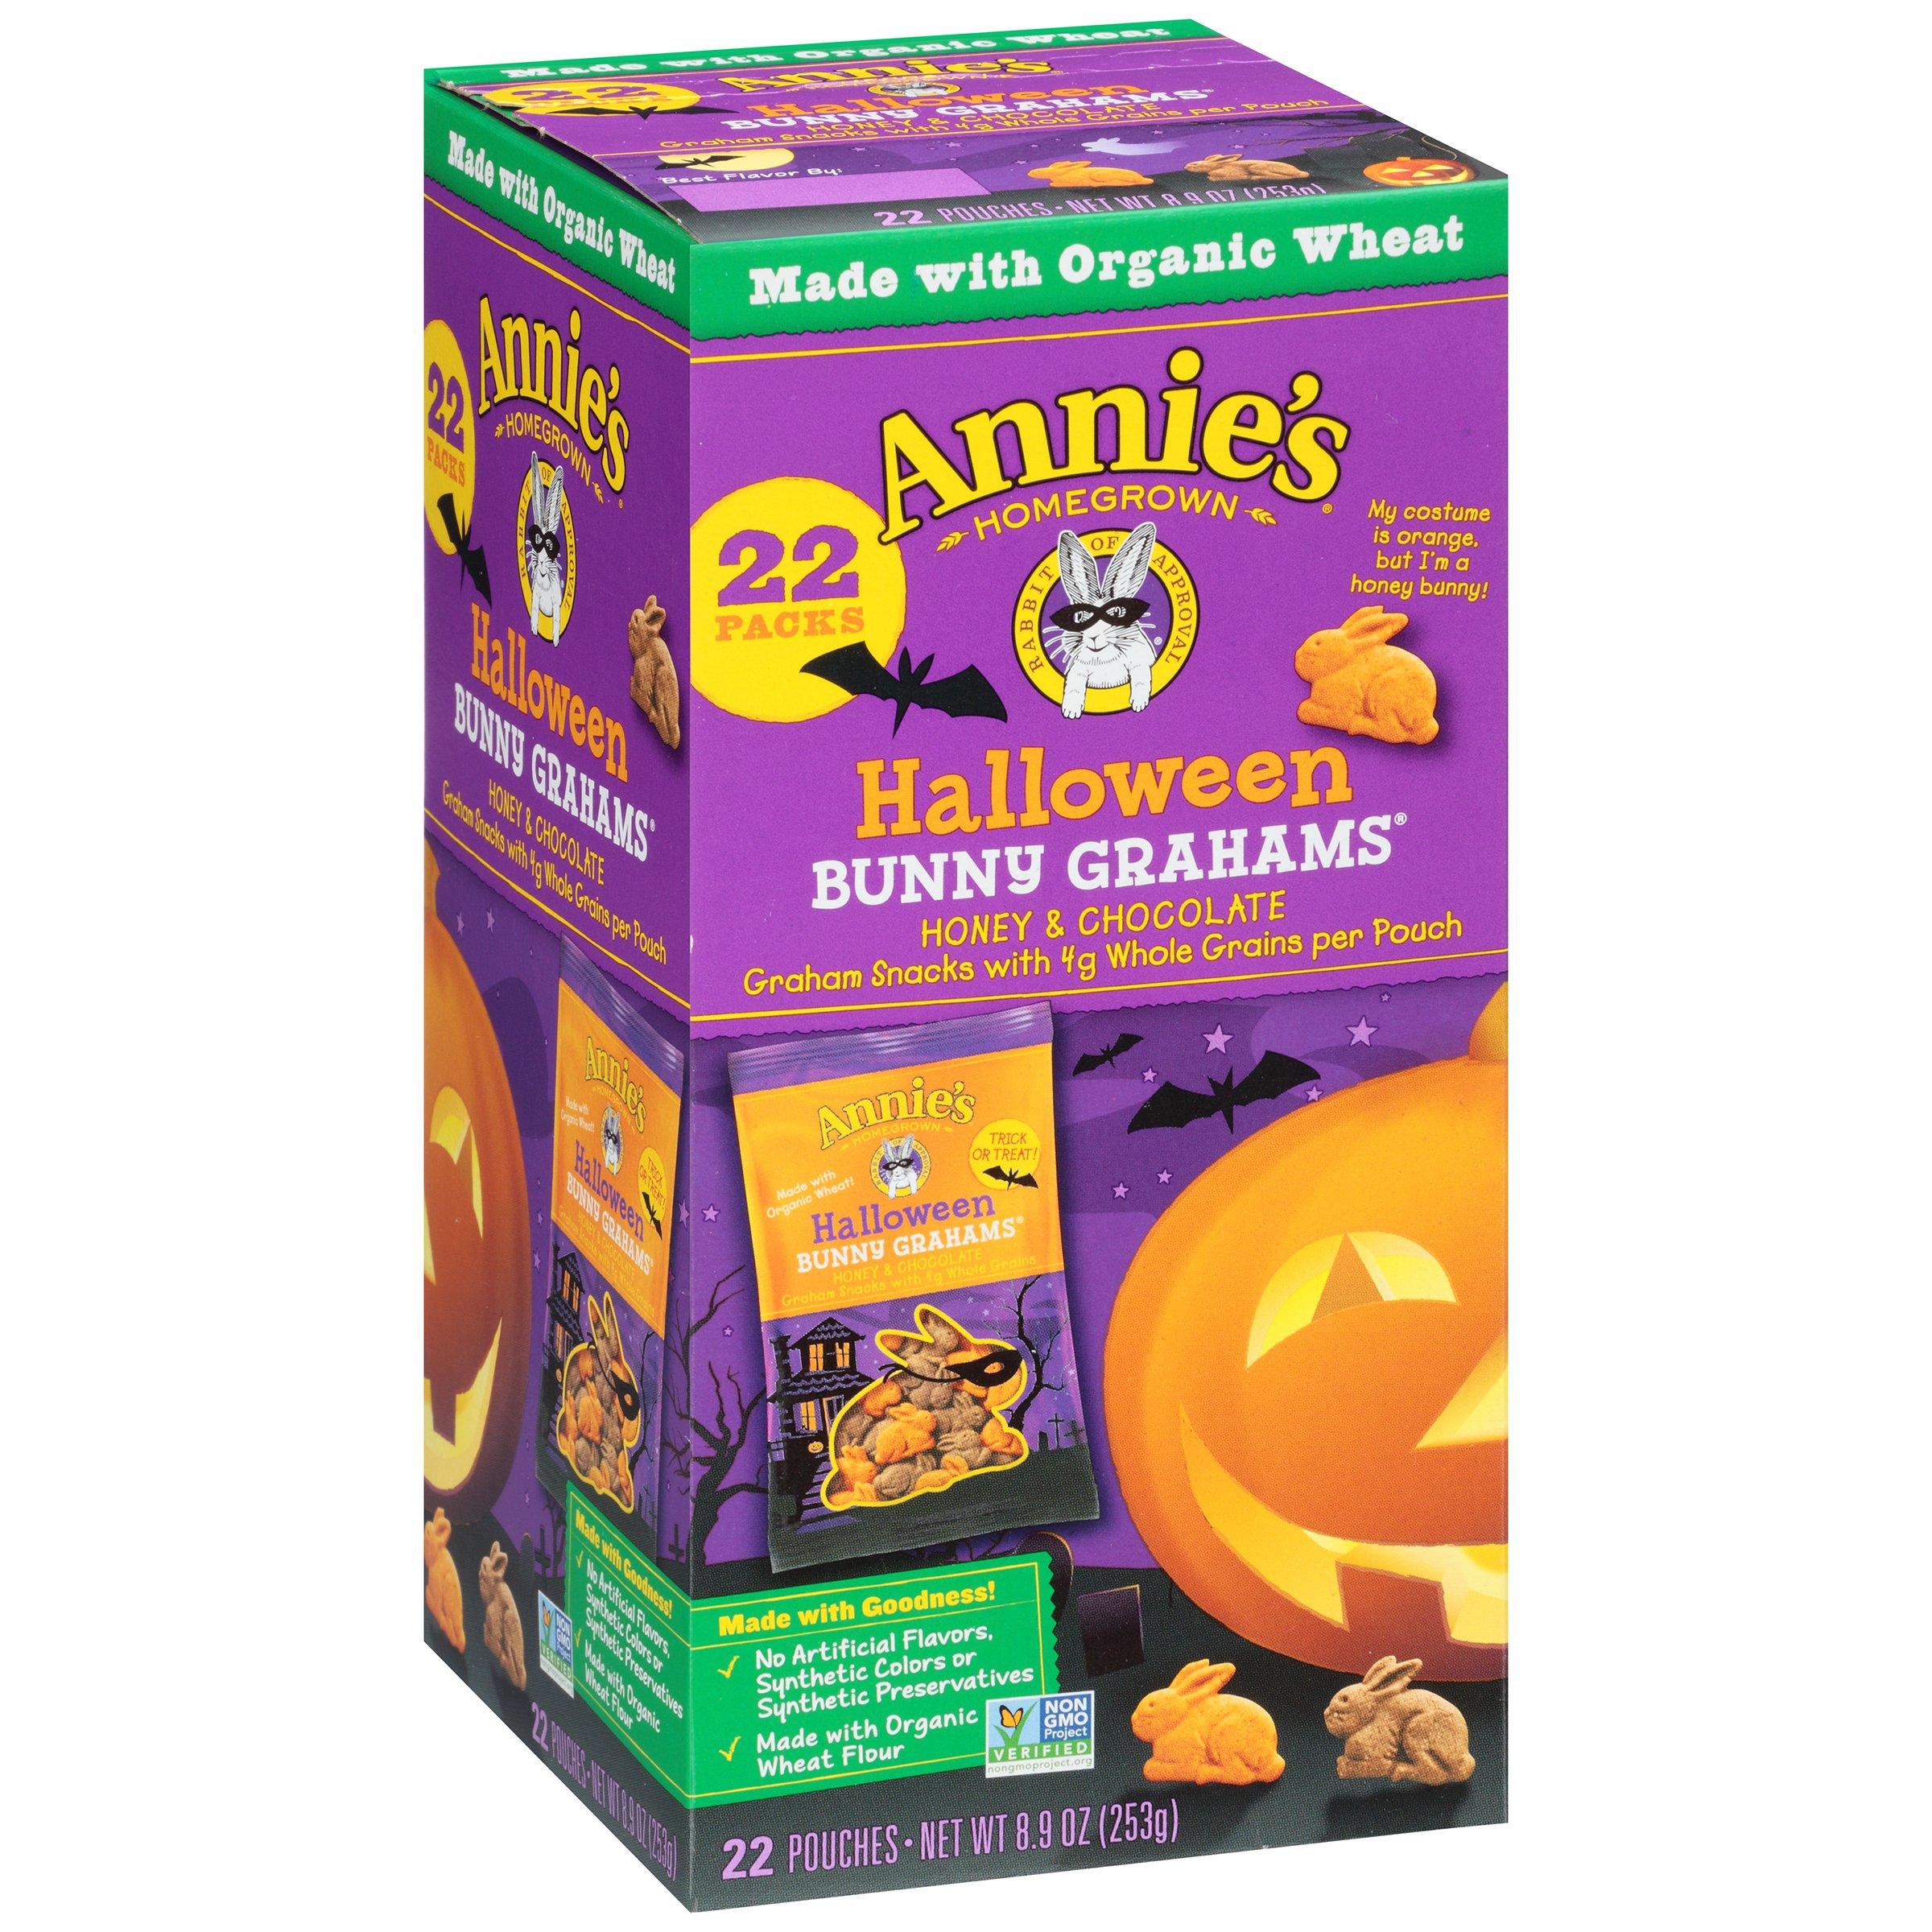 Annie's Halloween Bunny Whole Grain Graham Snacks, Honey and Chocolate, 8.9 oz